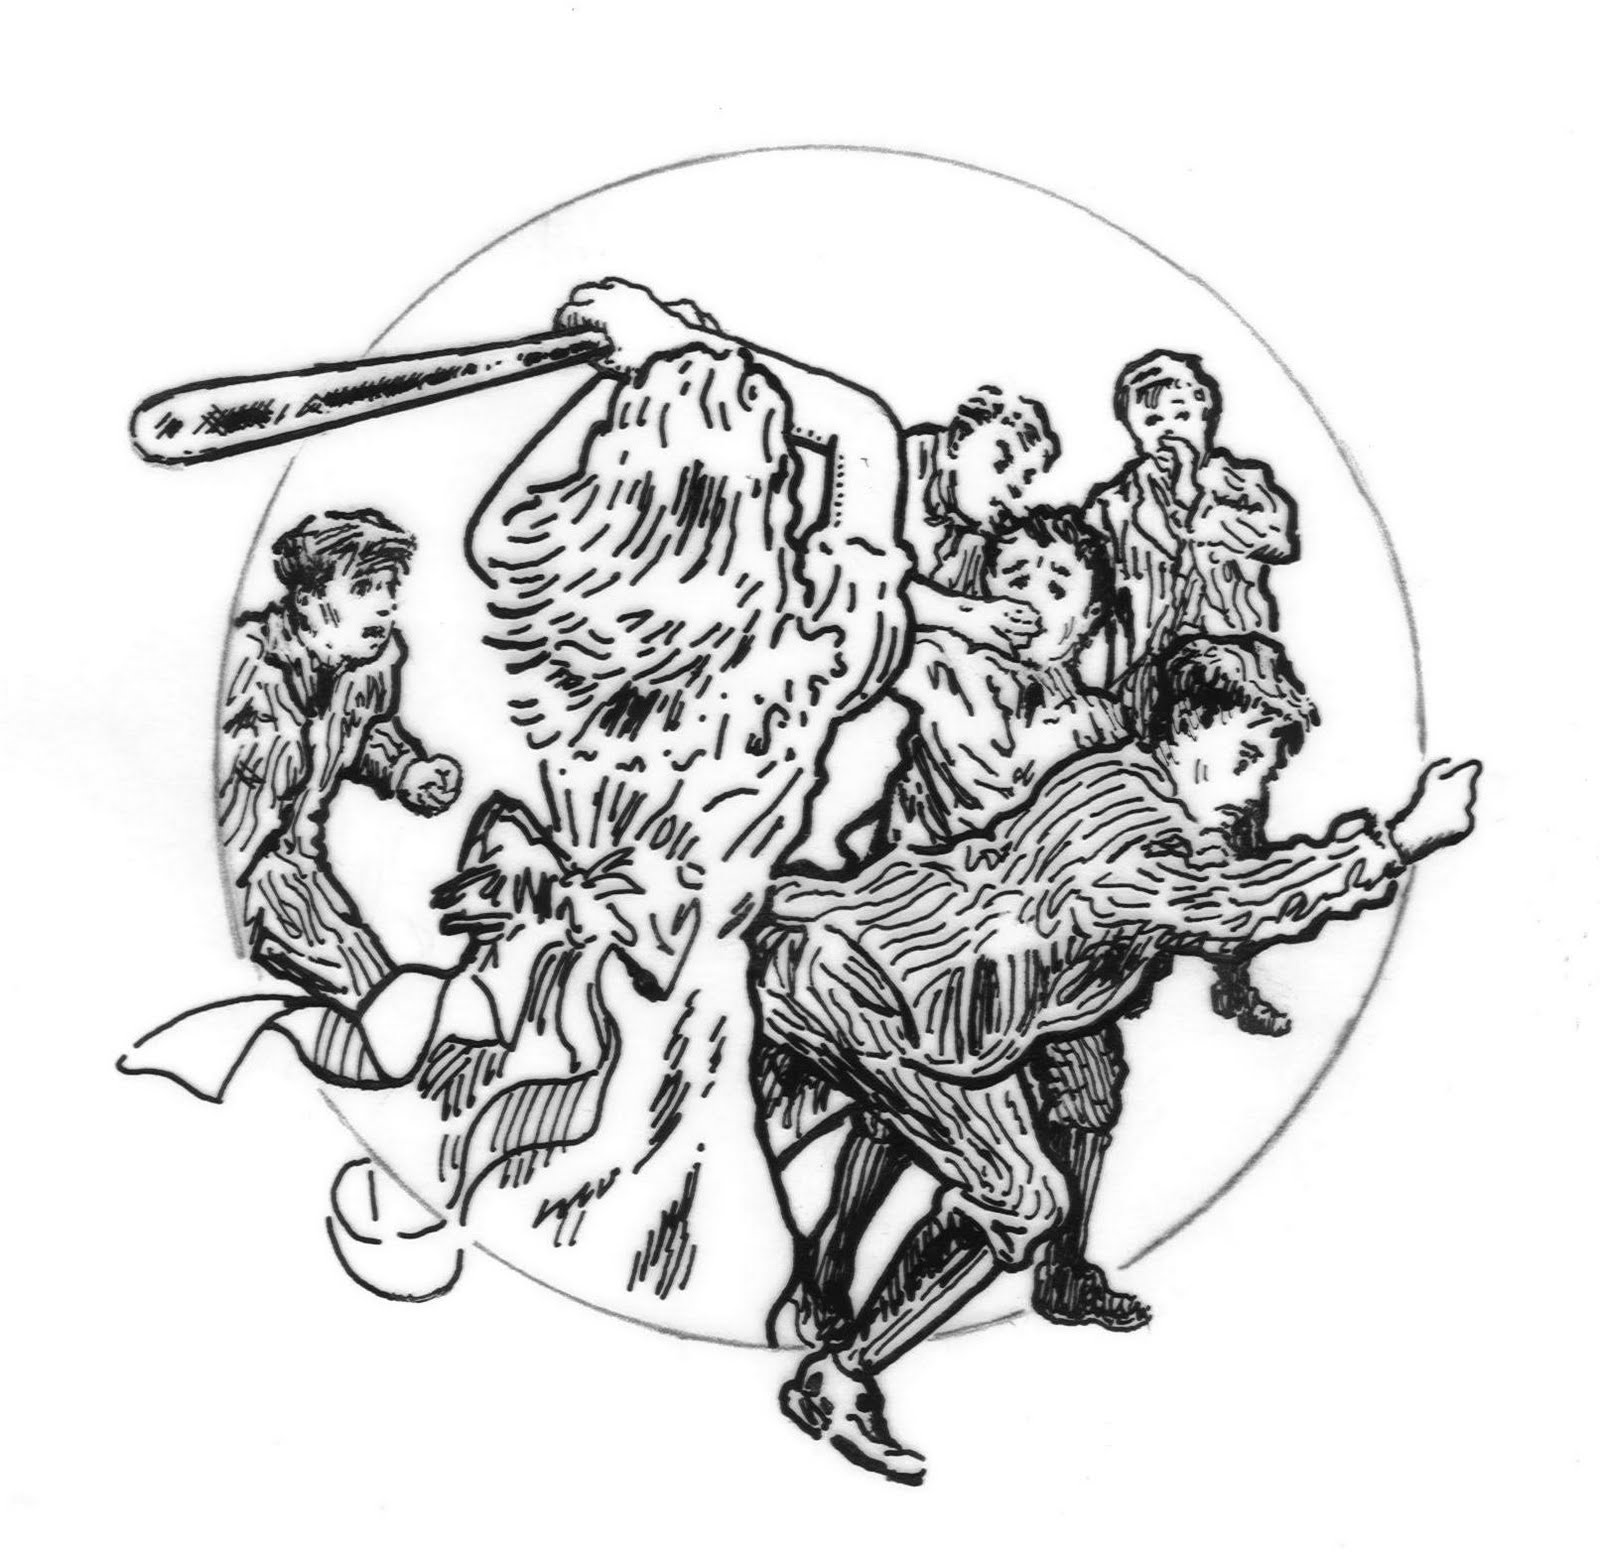 Mark Edward Geyer Illustration Blog: The Inquisitor's